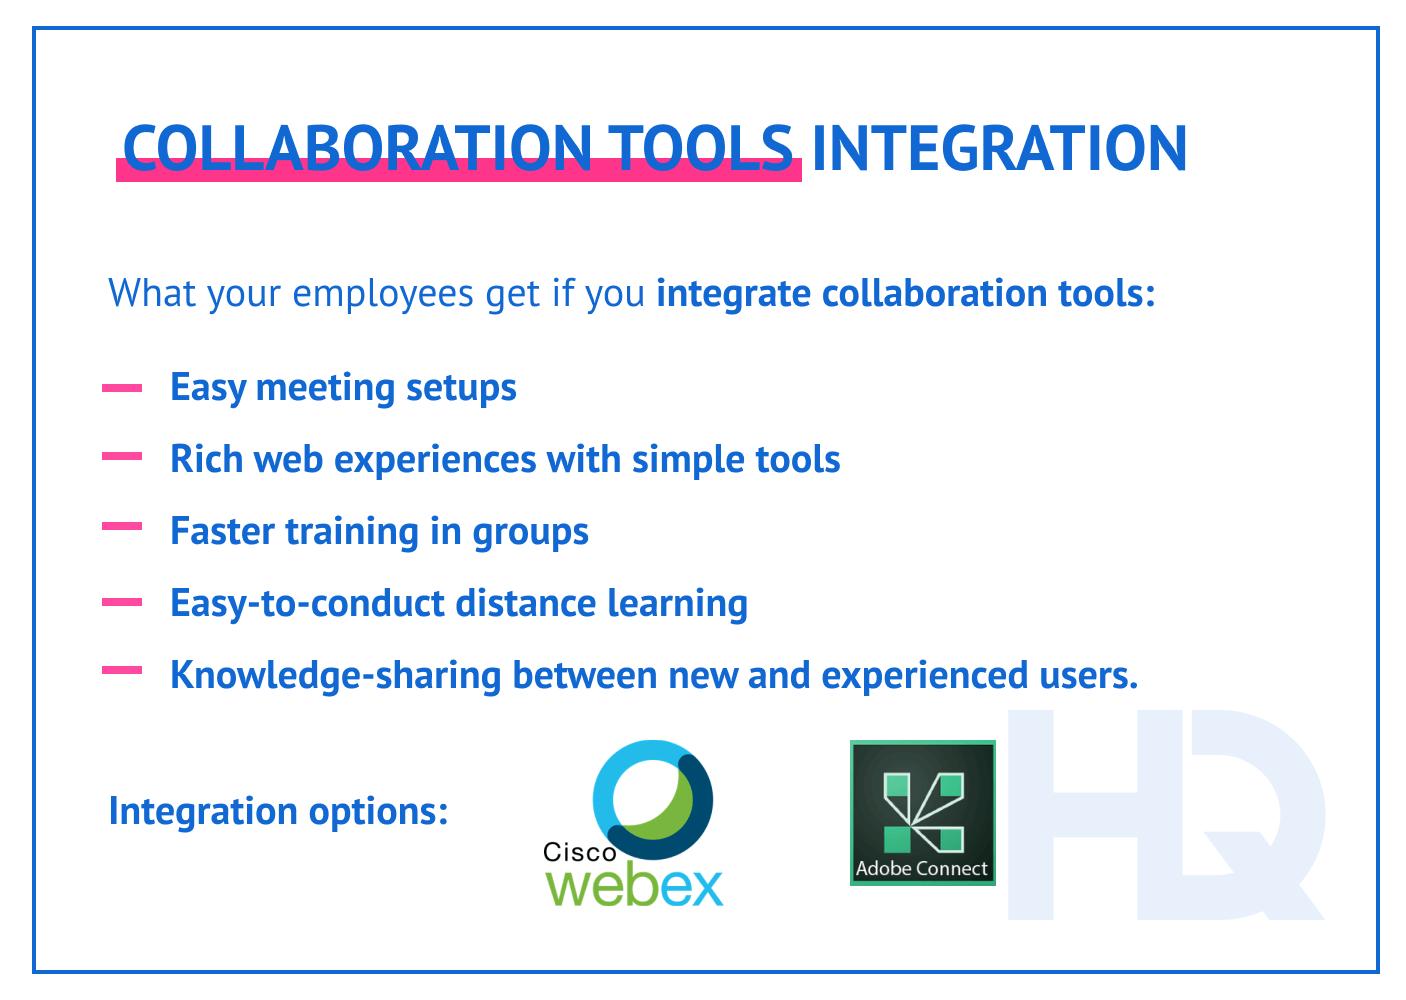 Collaboration tools integration